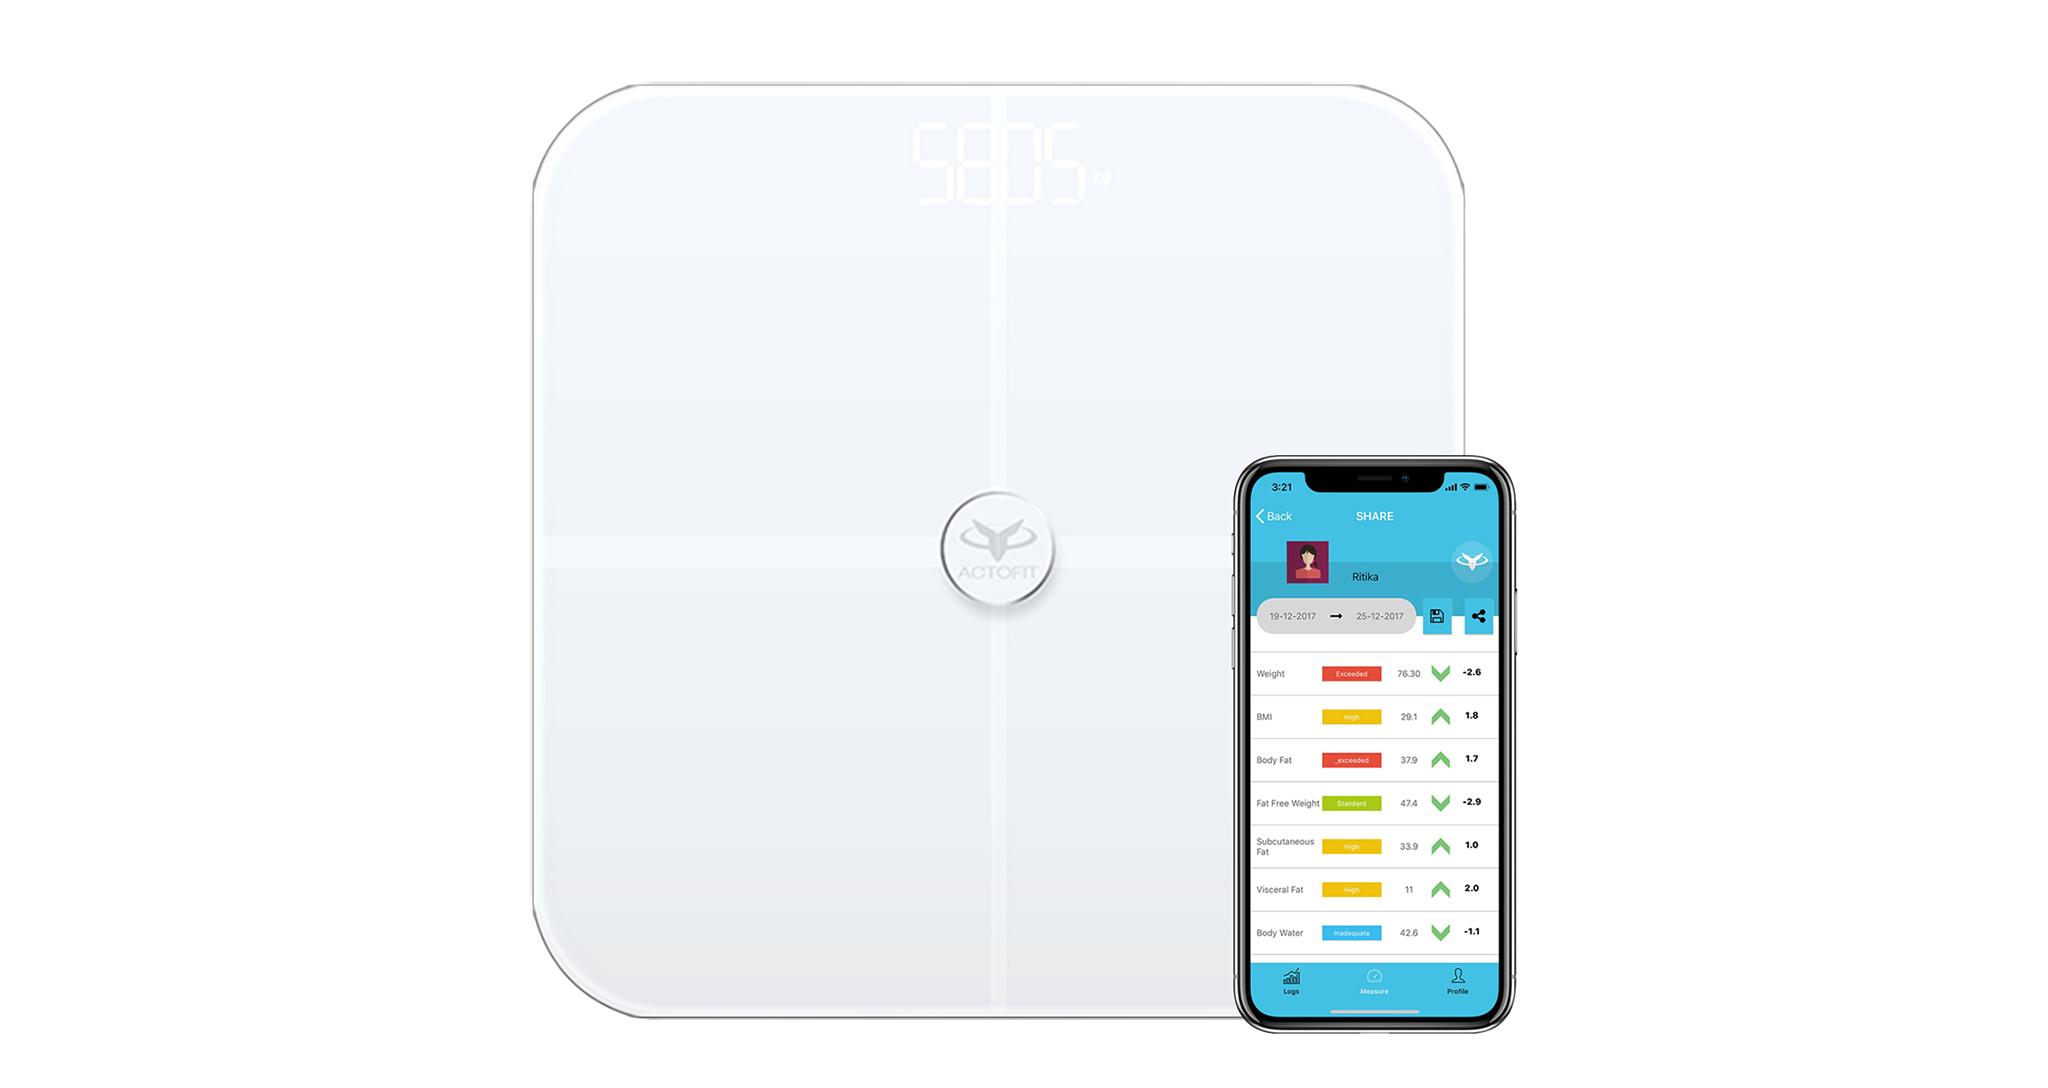 actofit smartscale with iOS app